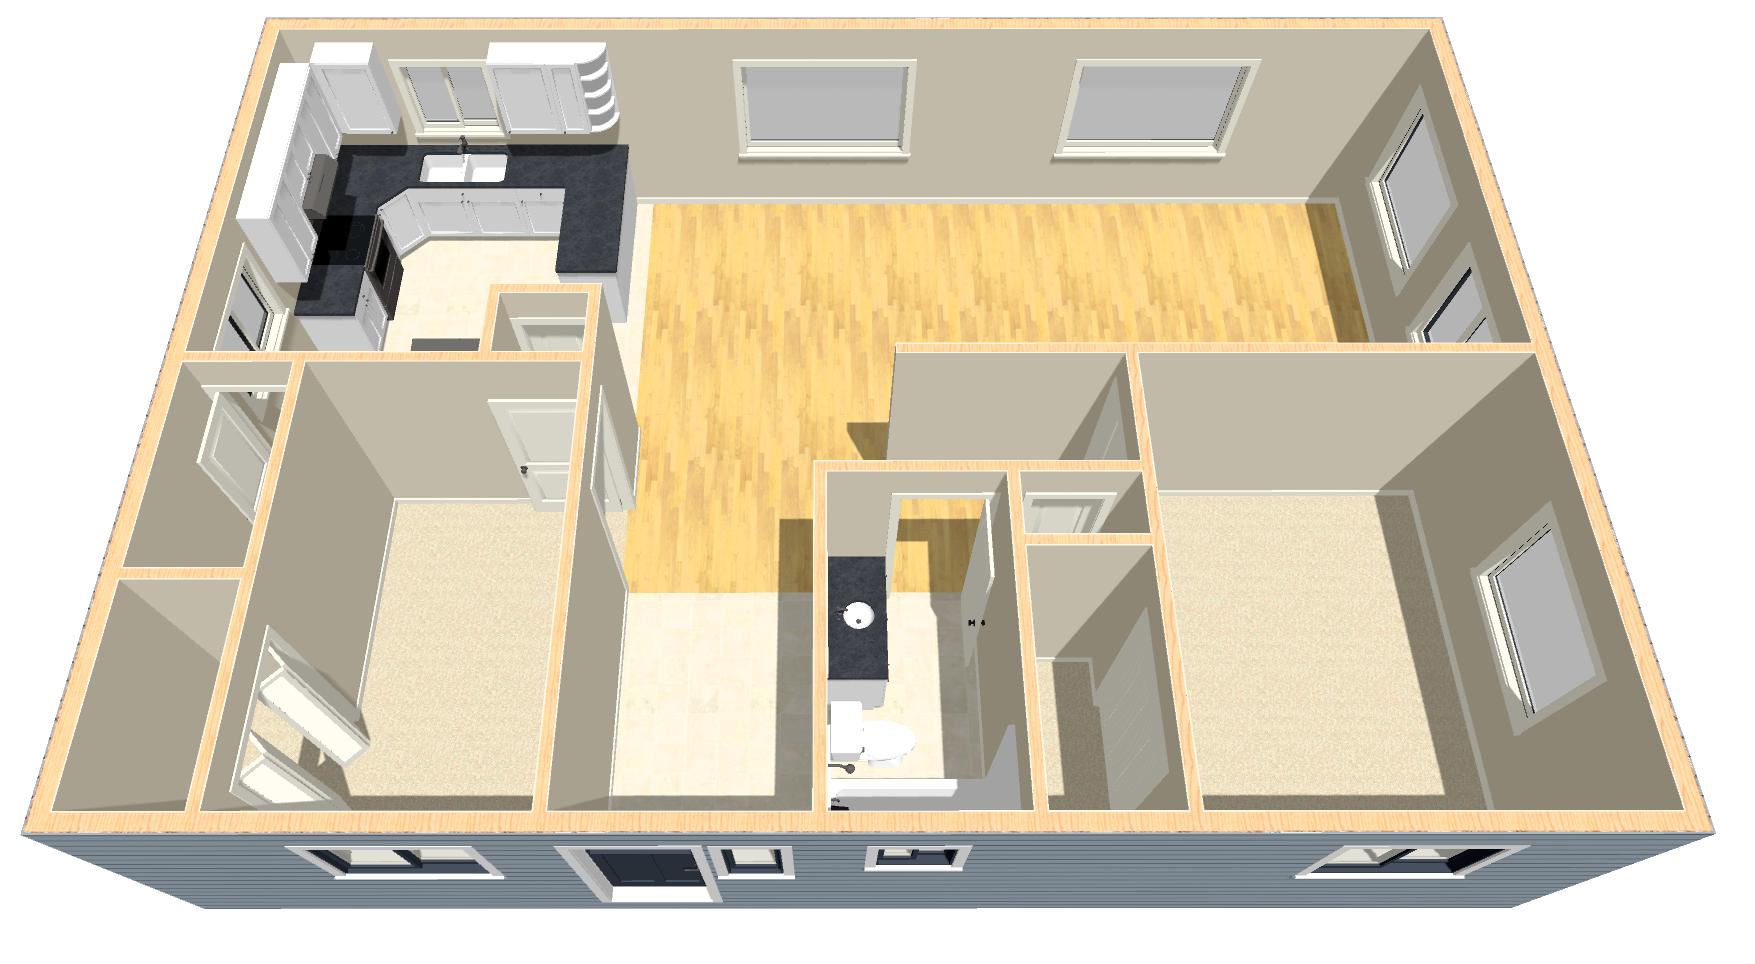 Siding shouse page 2 architecture design for Shouse designs